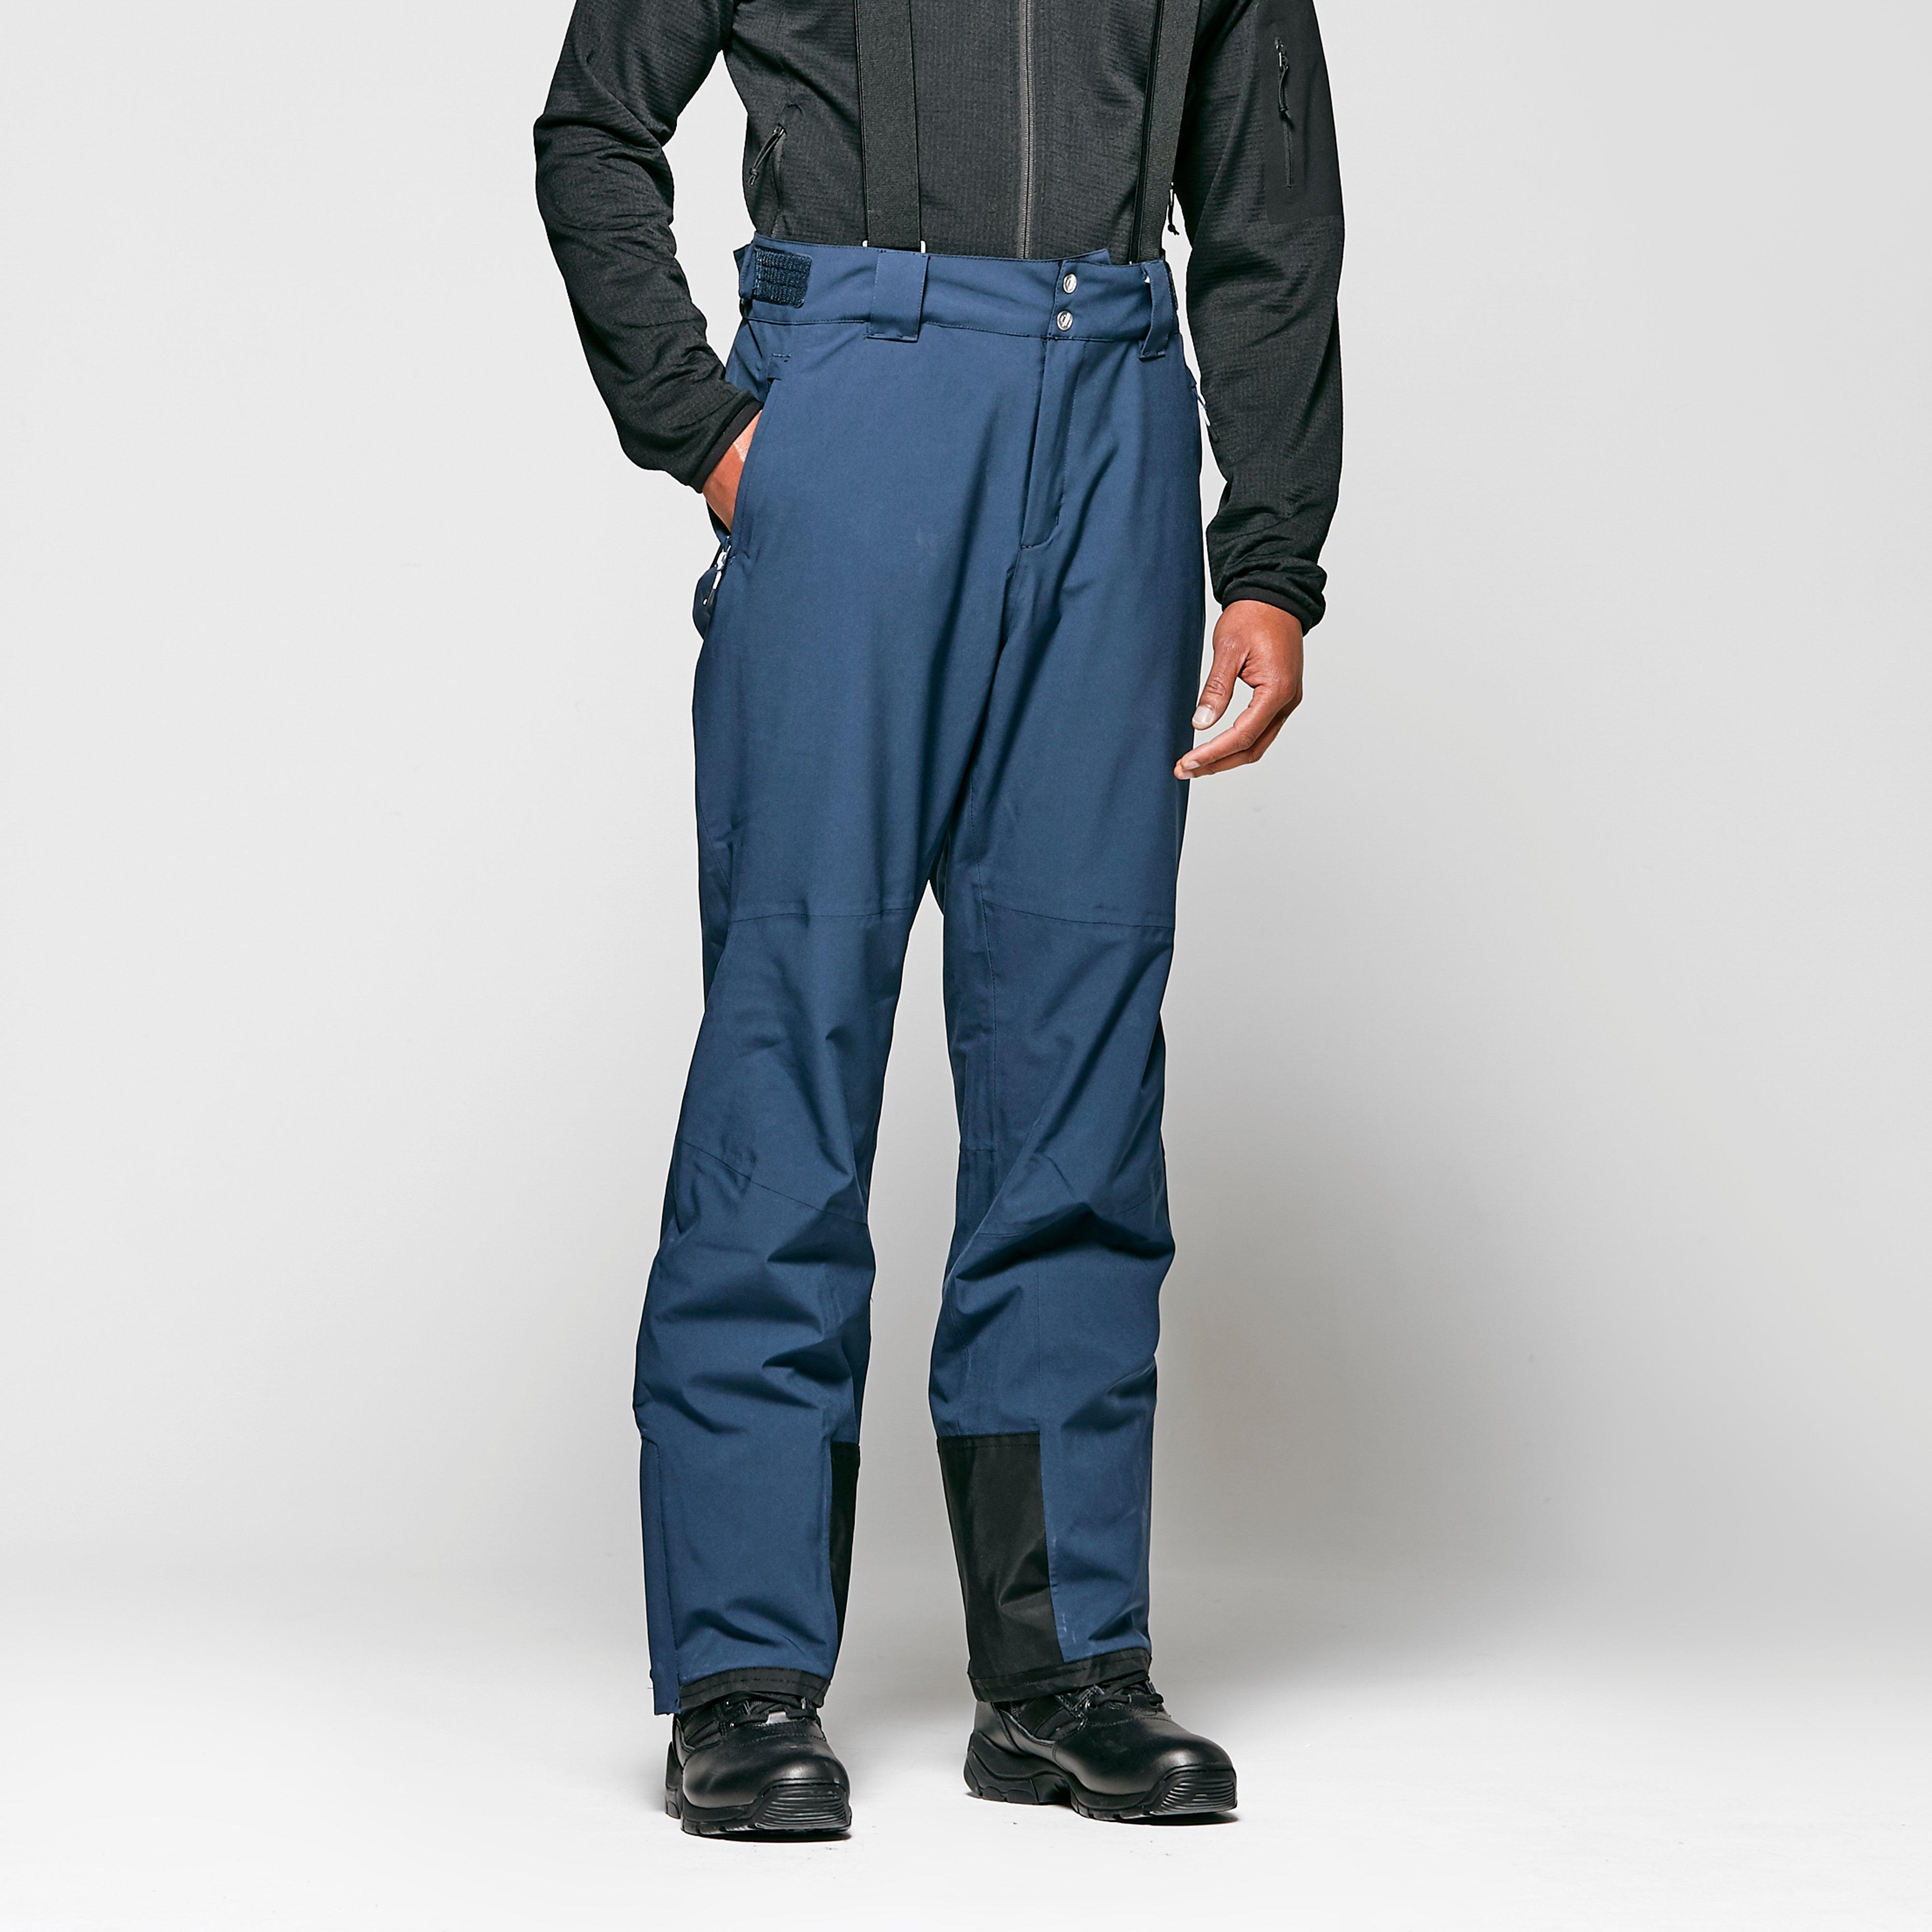 Dare 2B Men's Achieve Ski Pants II, NAVY/NAVY